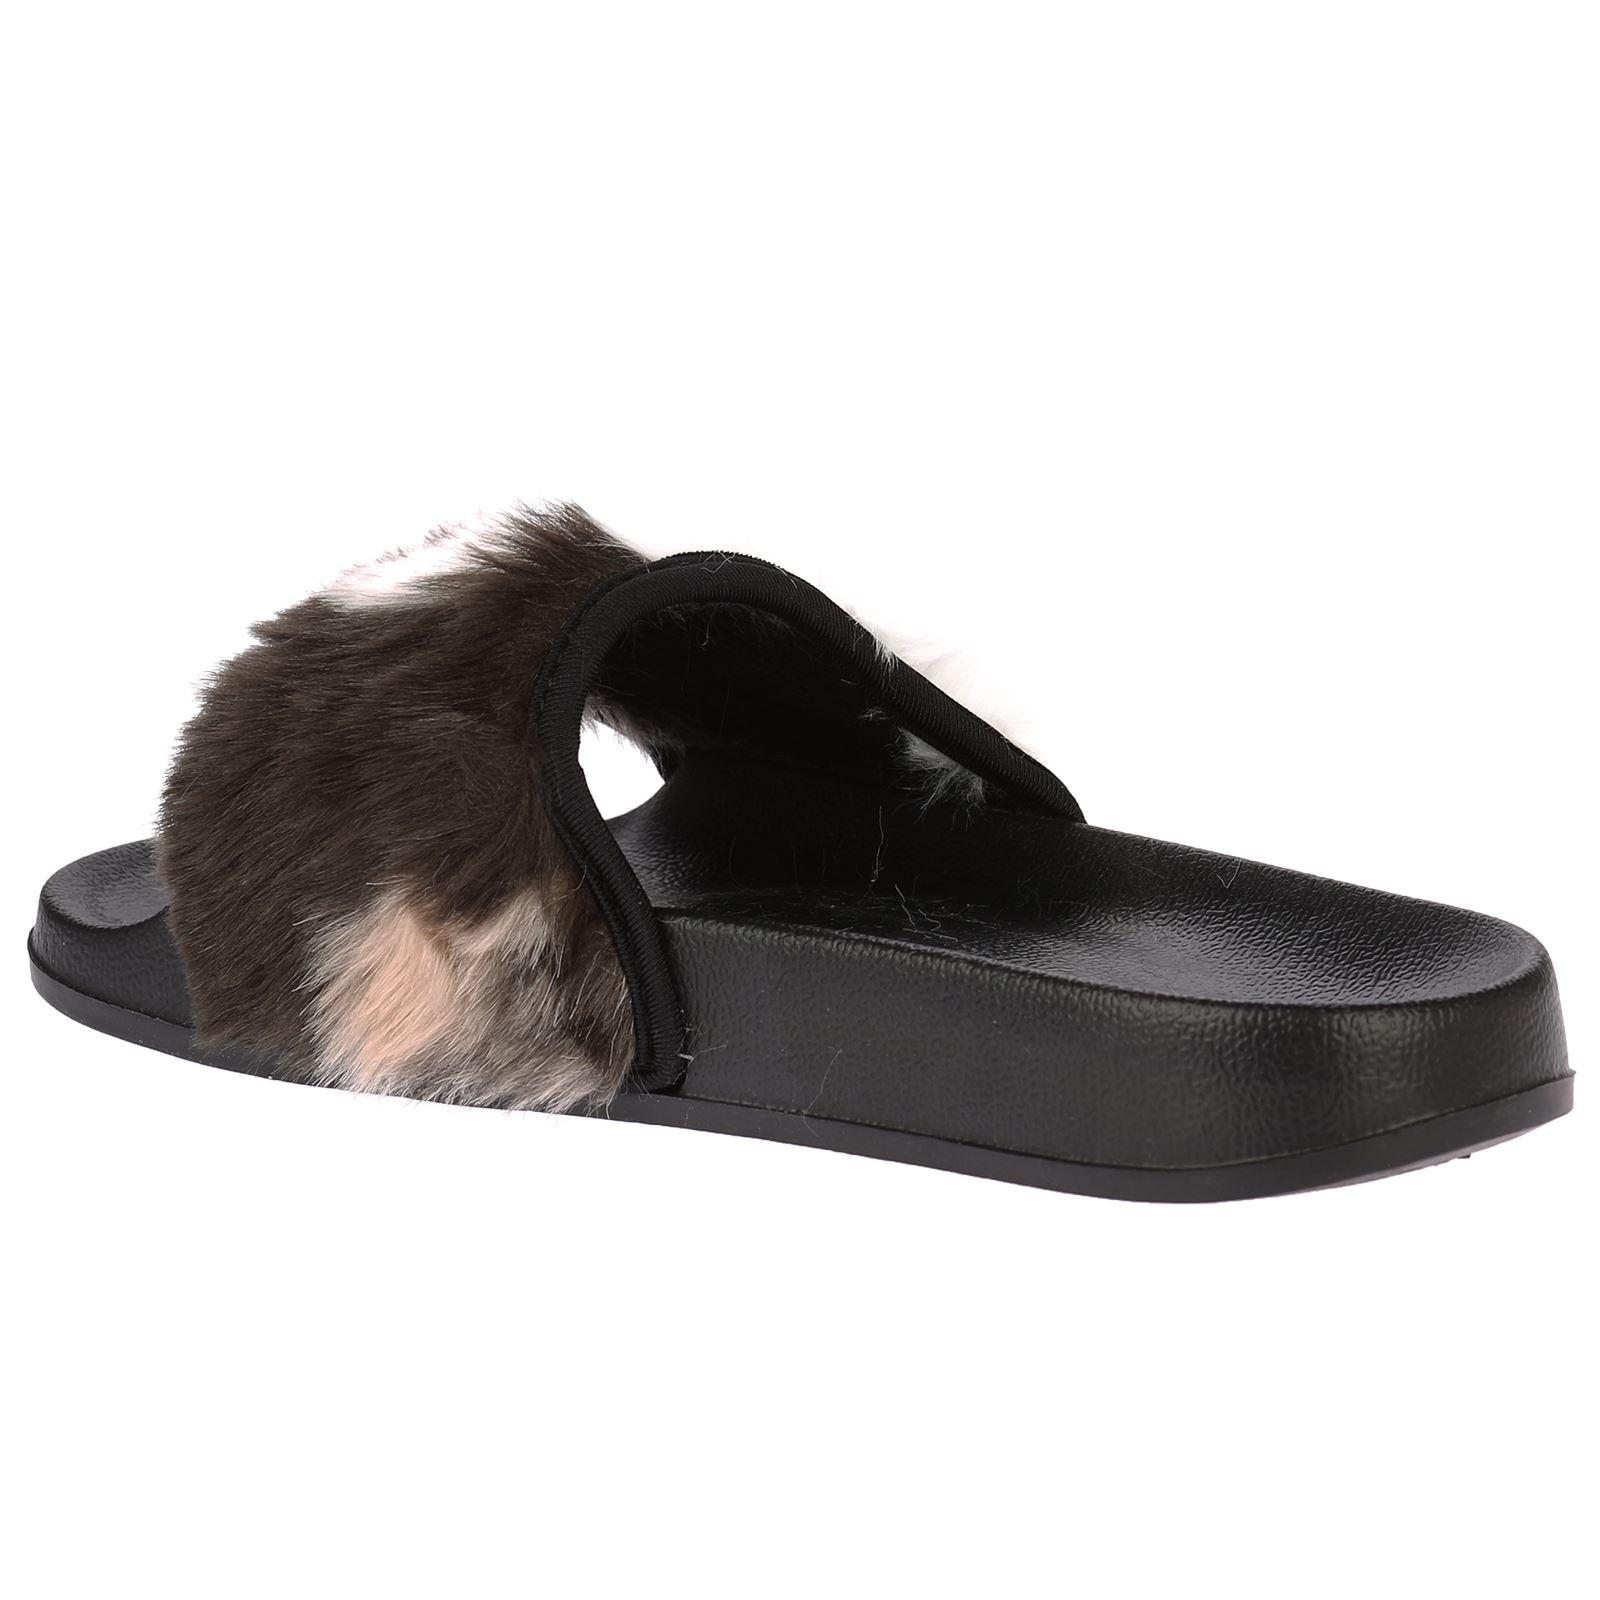 2a32800f447c Romy Womens Slip On Fur Flats Sandals Flip Flops Ladies Shoes ...